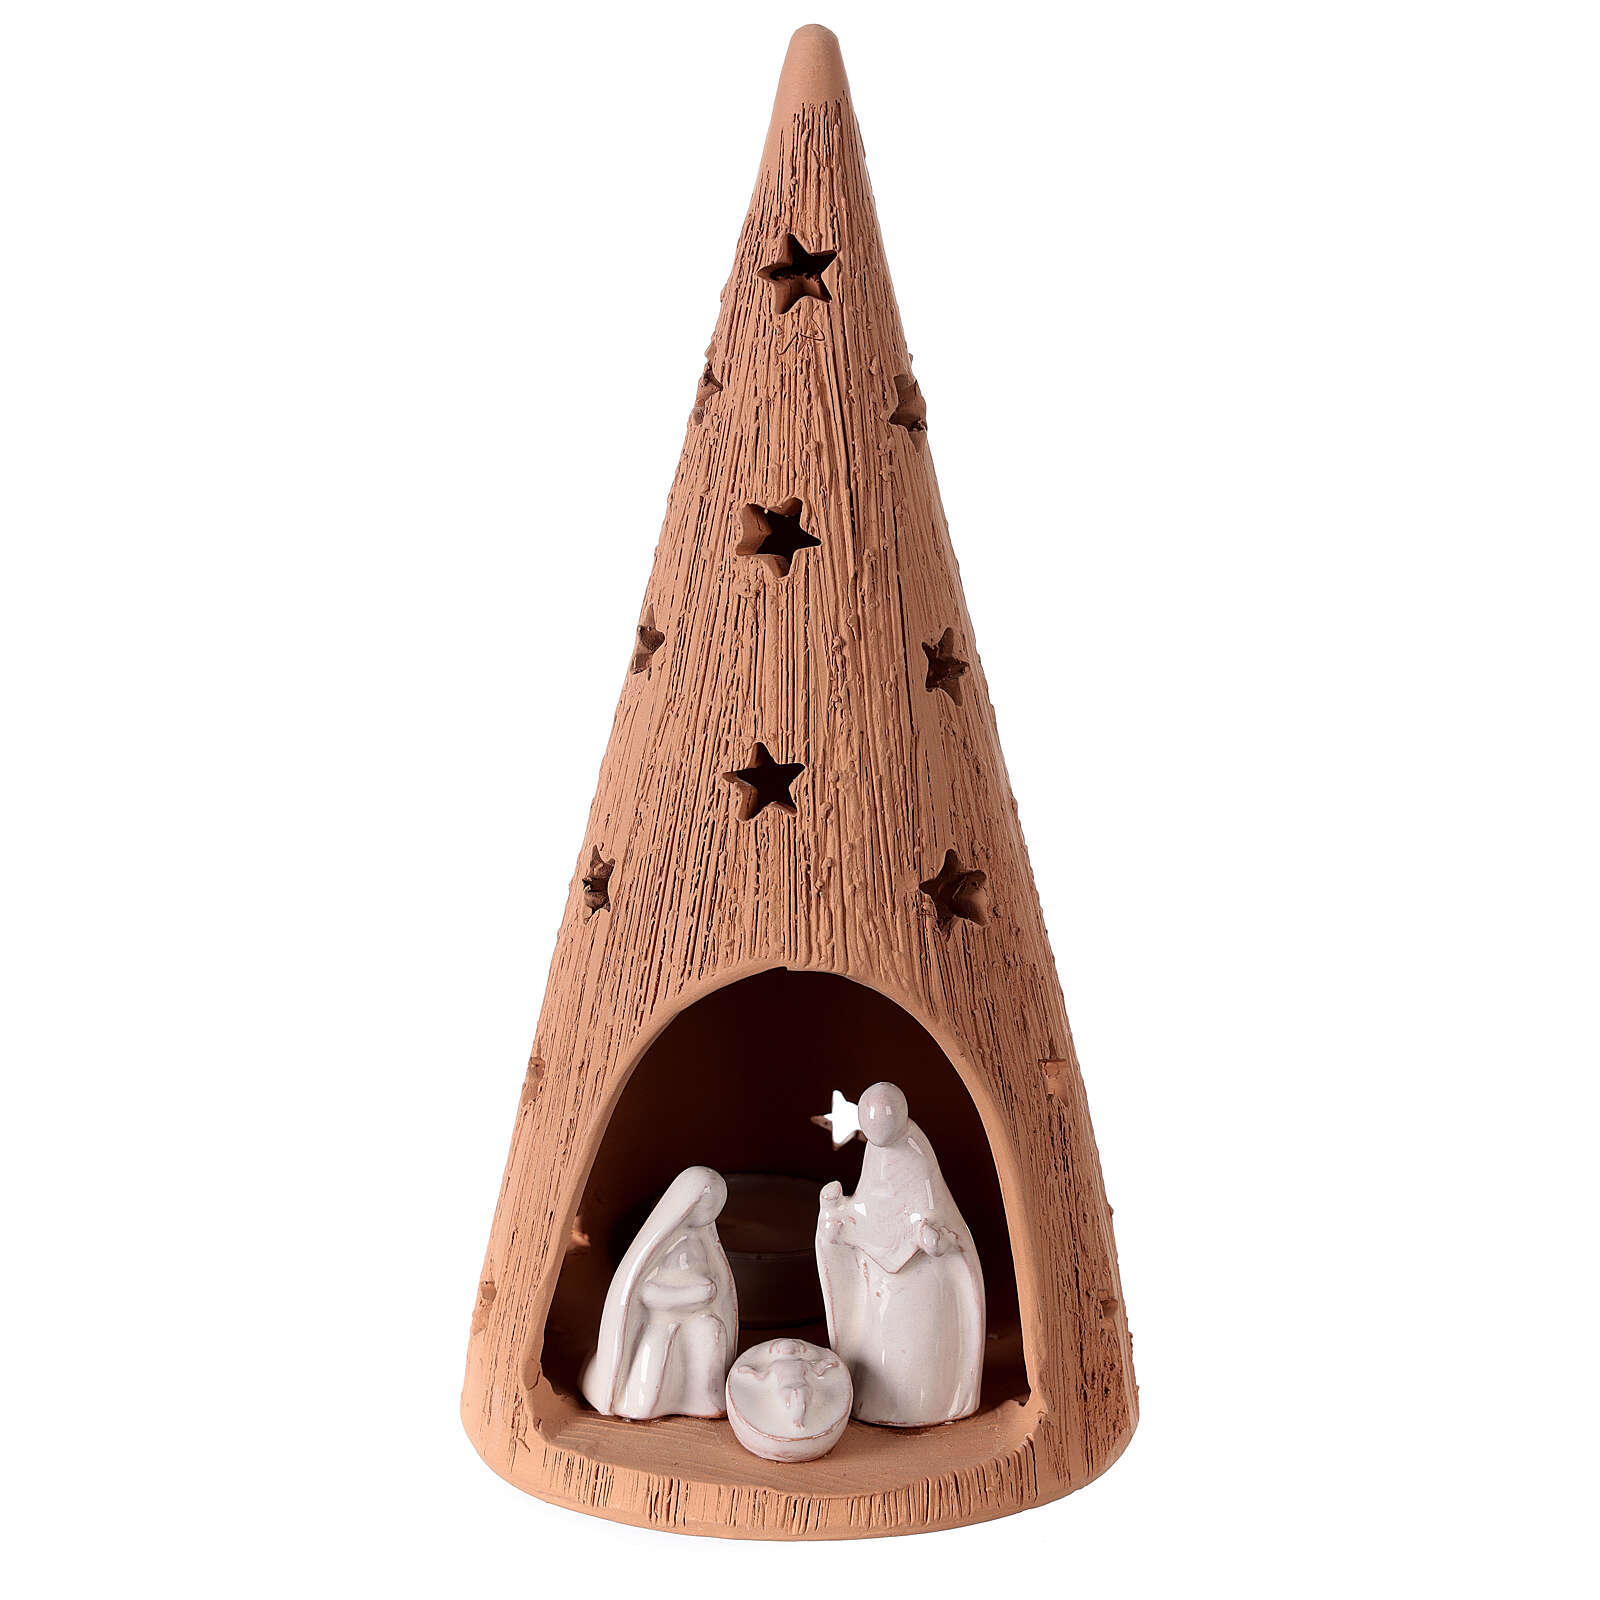 Cone with Nativity set white statues Deruta terracotta 25 cm 4